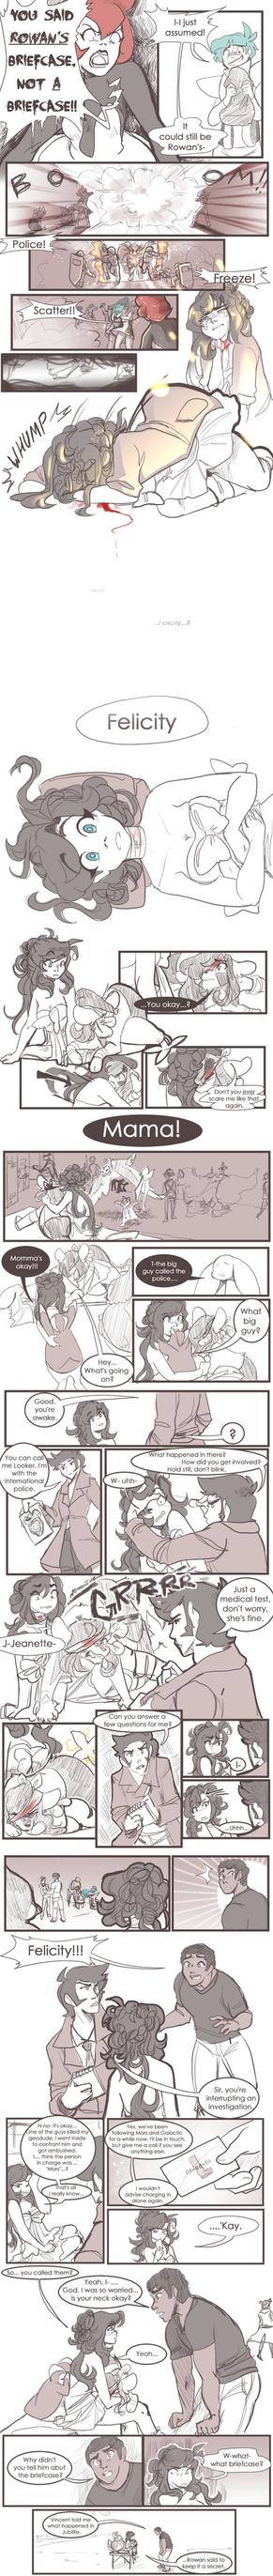 Lissylocke page 22 by Skitea